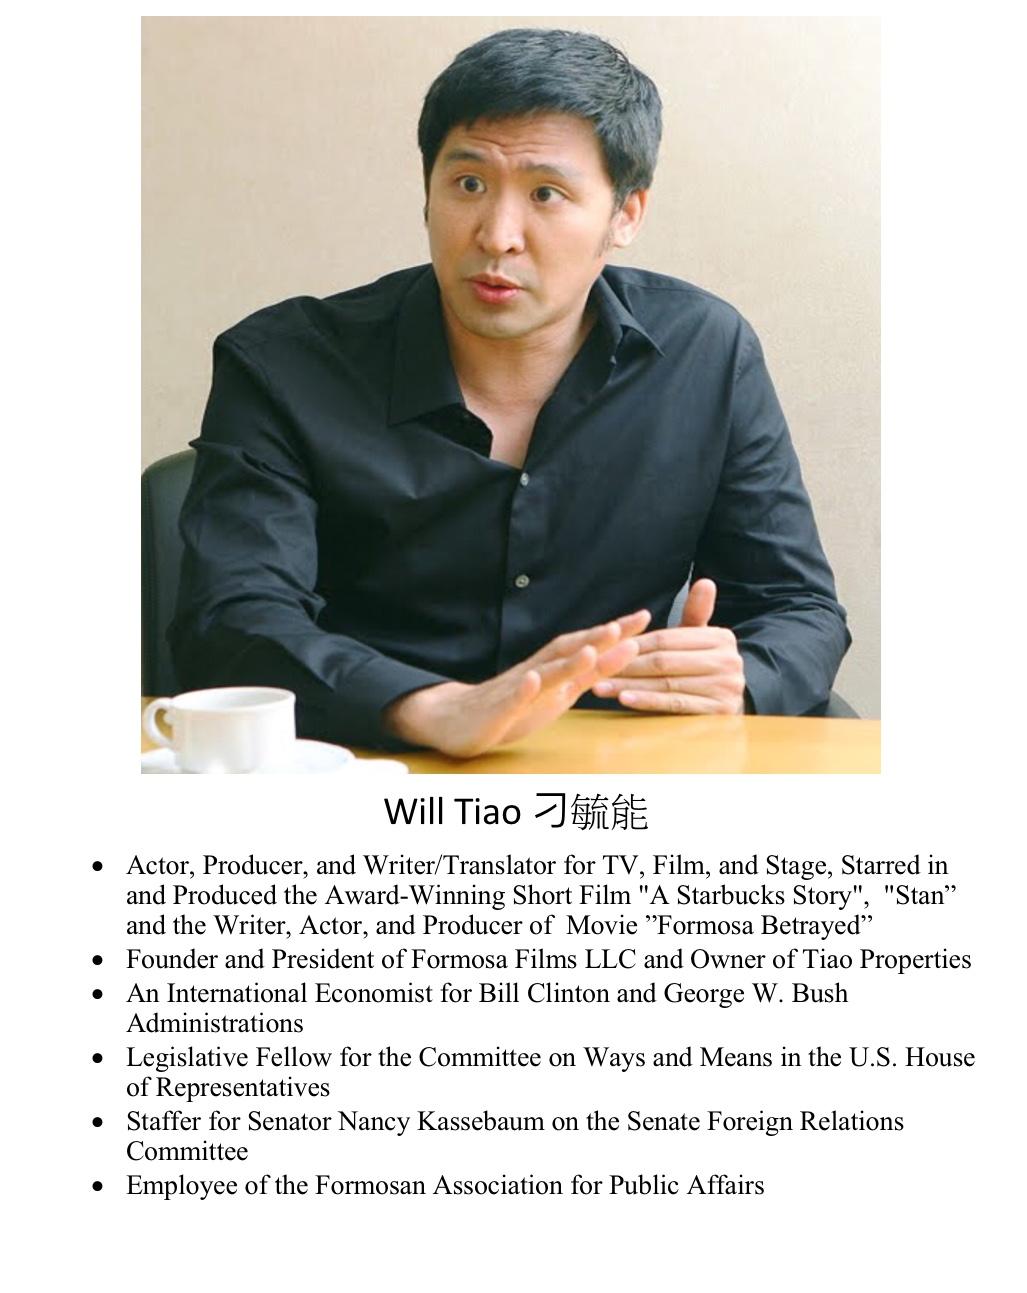 233. Will Tiao 刁毓能